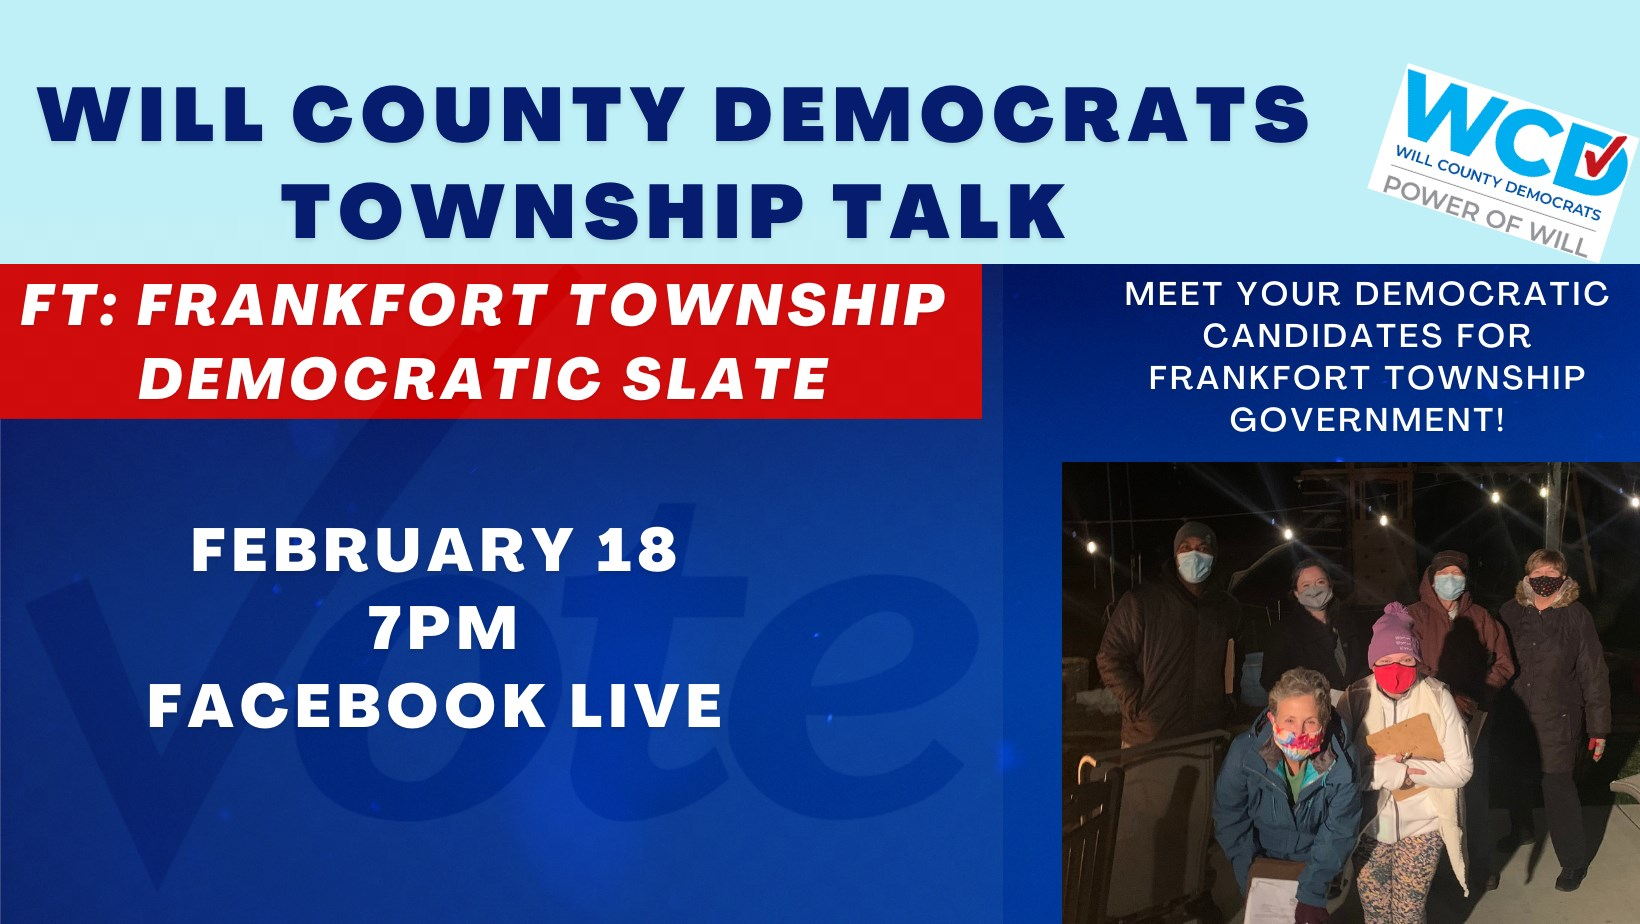 Township Talk: Frankfort Township